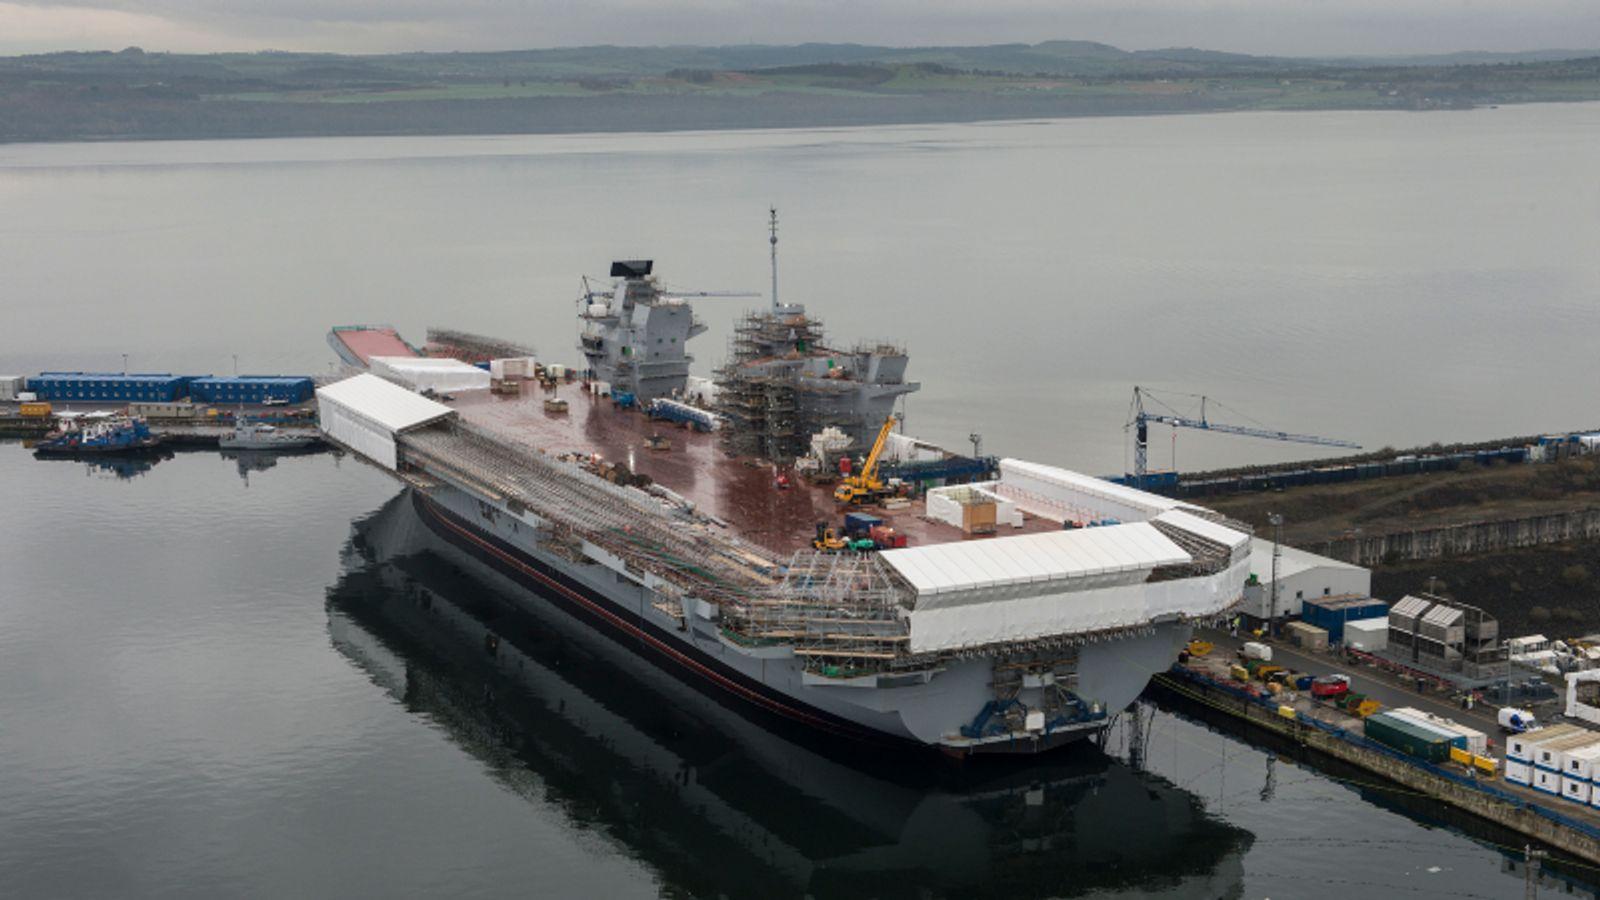 The aircraft carrier HMS Queen Elizabeth under construction at Rosyth Dockyard, Scotland. Pic: MoD